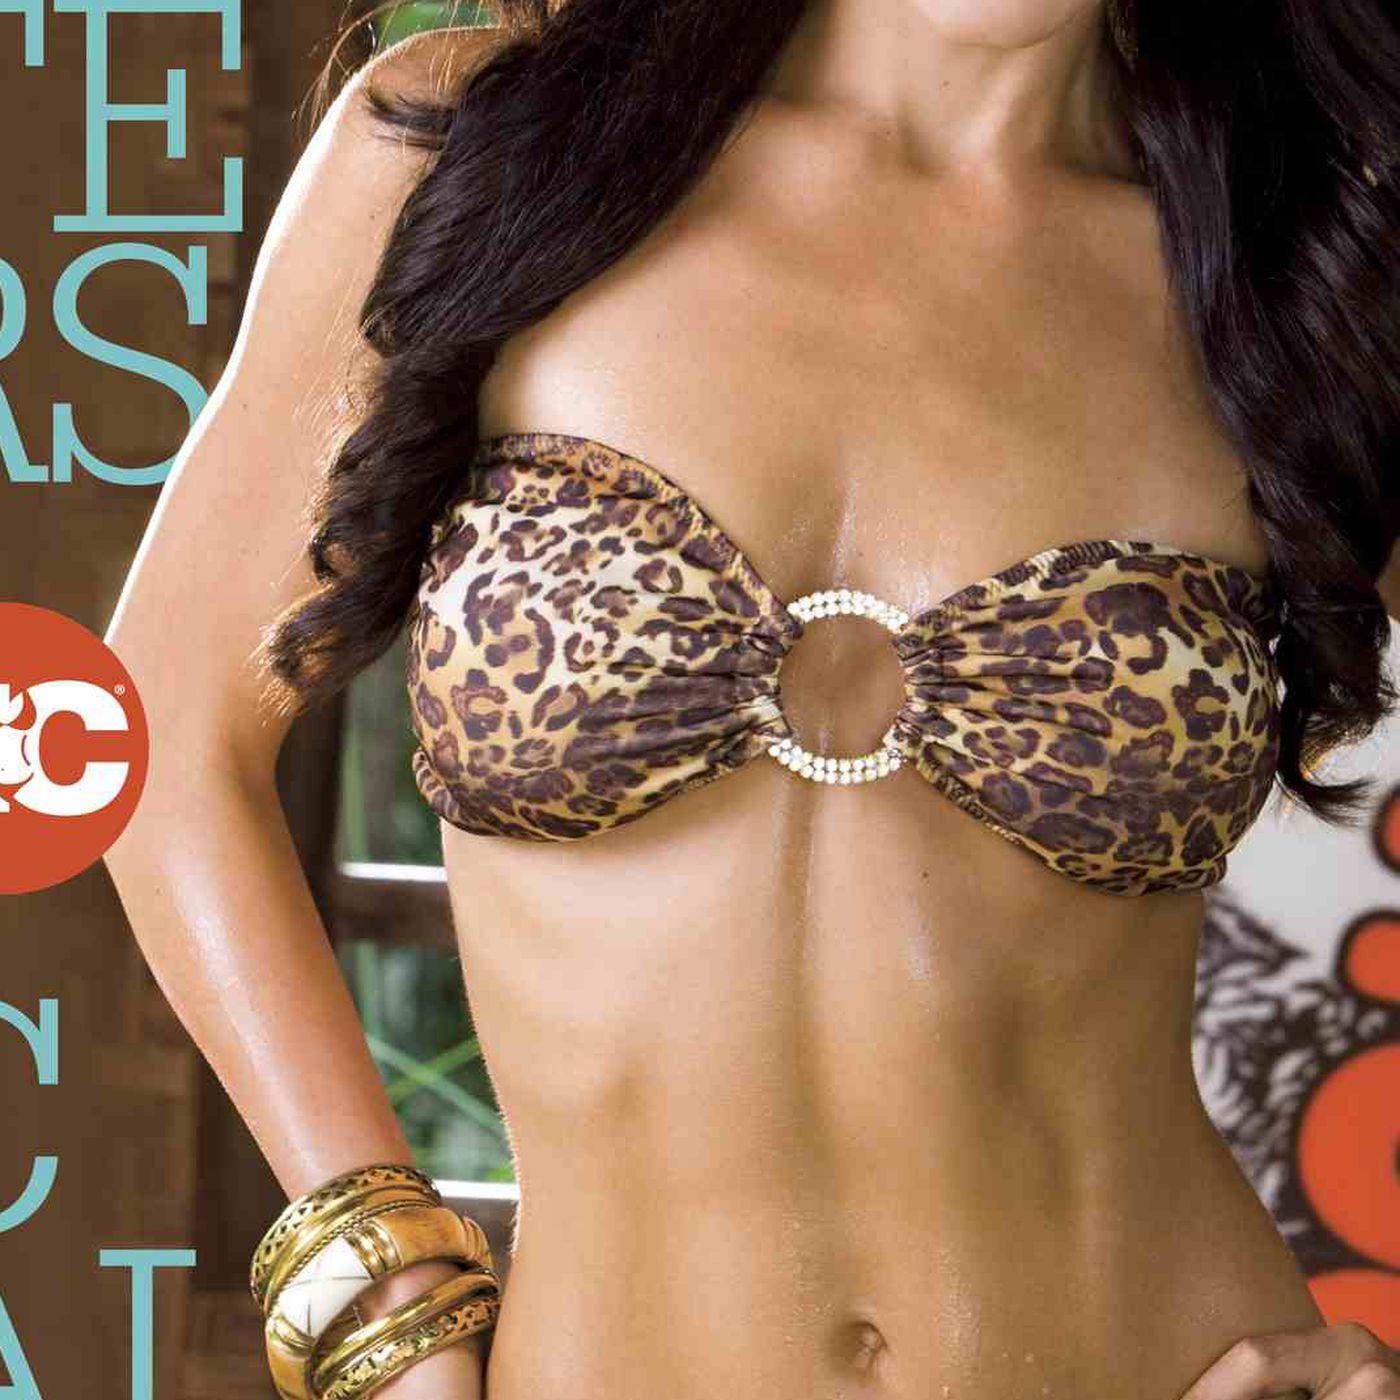 Hooters tn girls big boobs Beauty Secrets Of The Girls Of Hooters 2012 Calendar Edition Racked